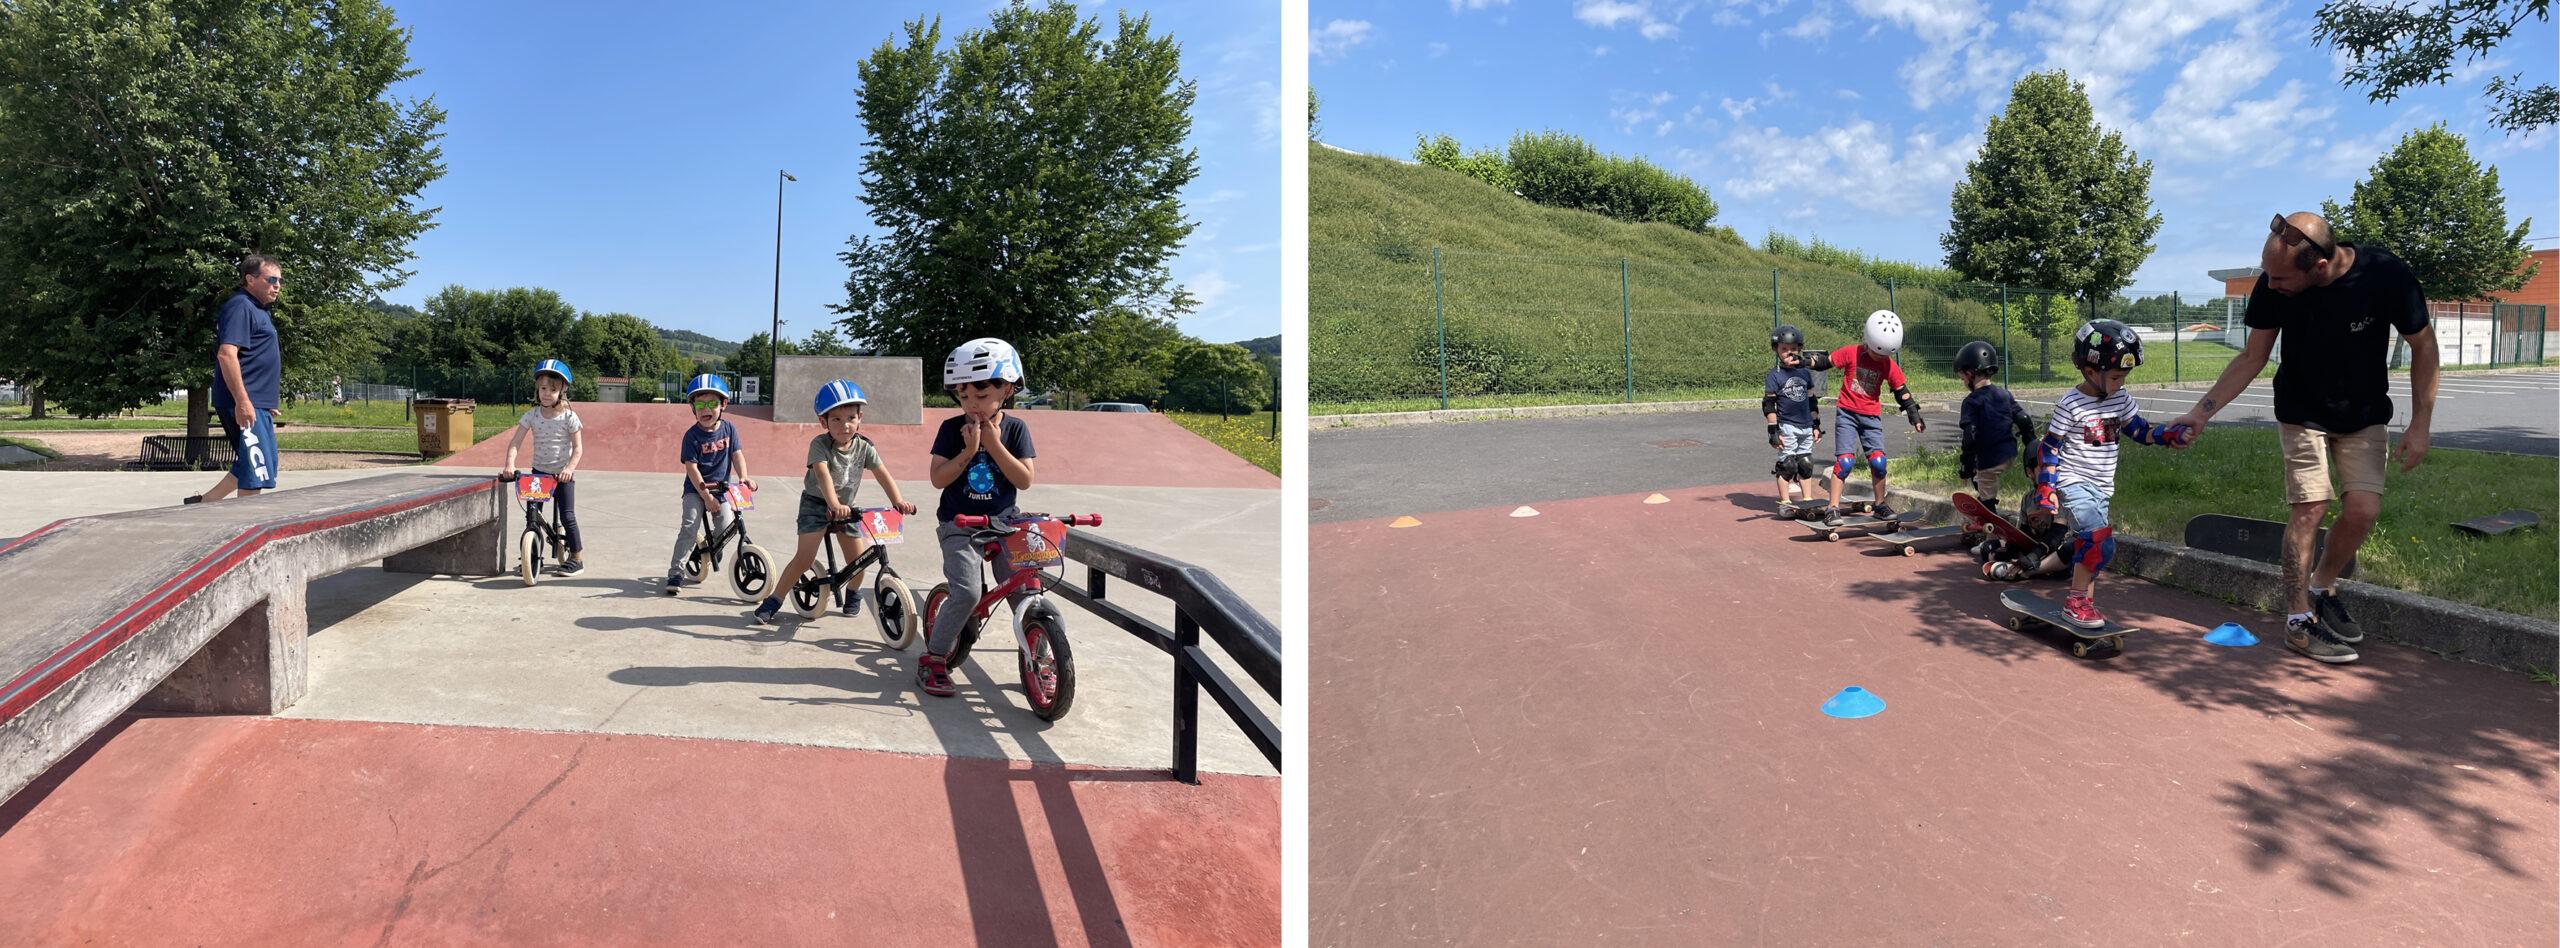 Riding School «Draisienne & Baby Skate»